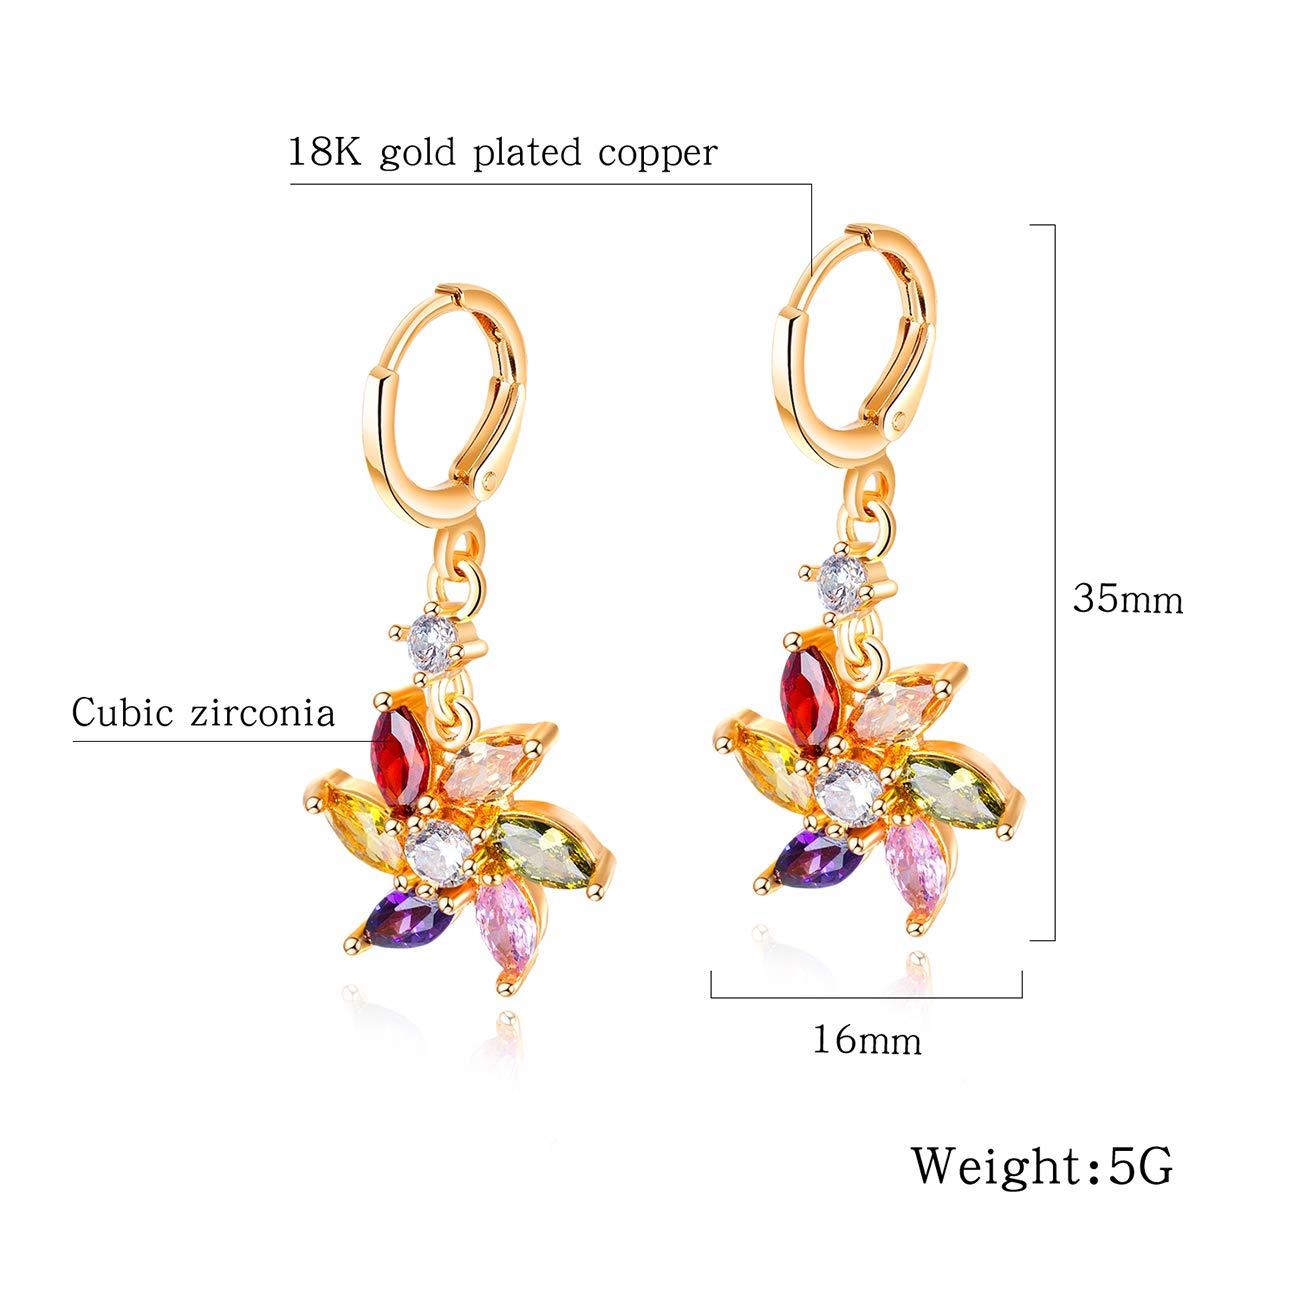 Soonvinia Rose Gold Leverback Dangle Drop Earrings Colorful Cubic Zirconia Windmill Earrings Gift for Women Girls